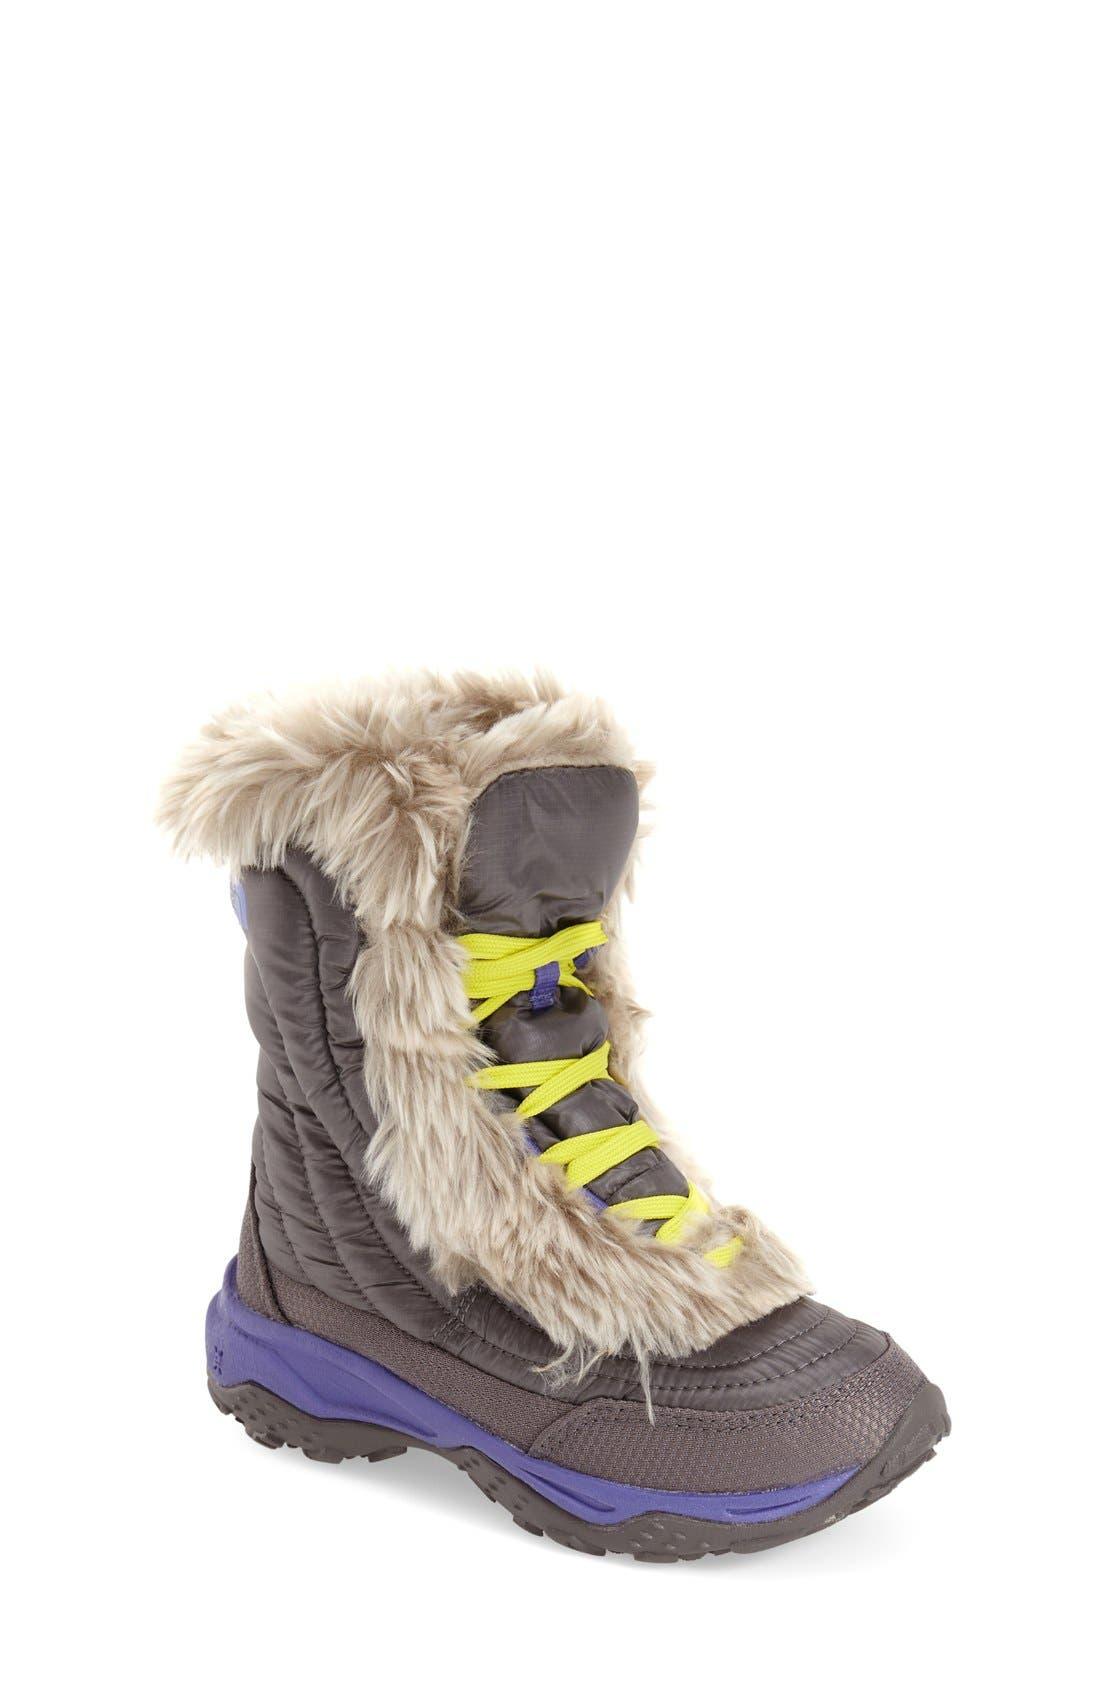 Alternate Image 1 Selected - The North Face 'Nuptse Fur' Boot (Little Kid & Big Kid)